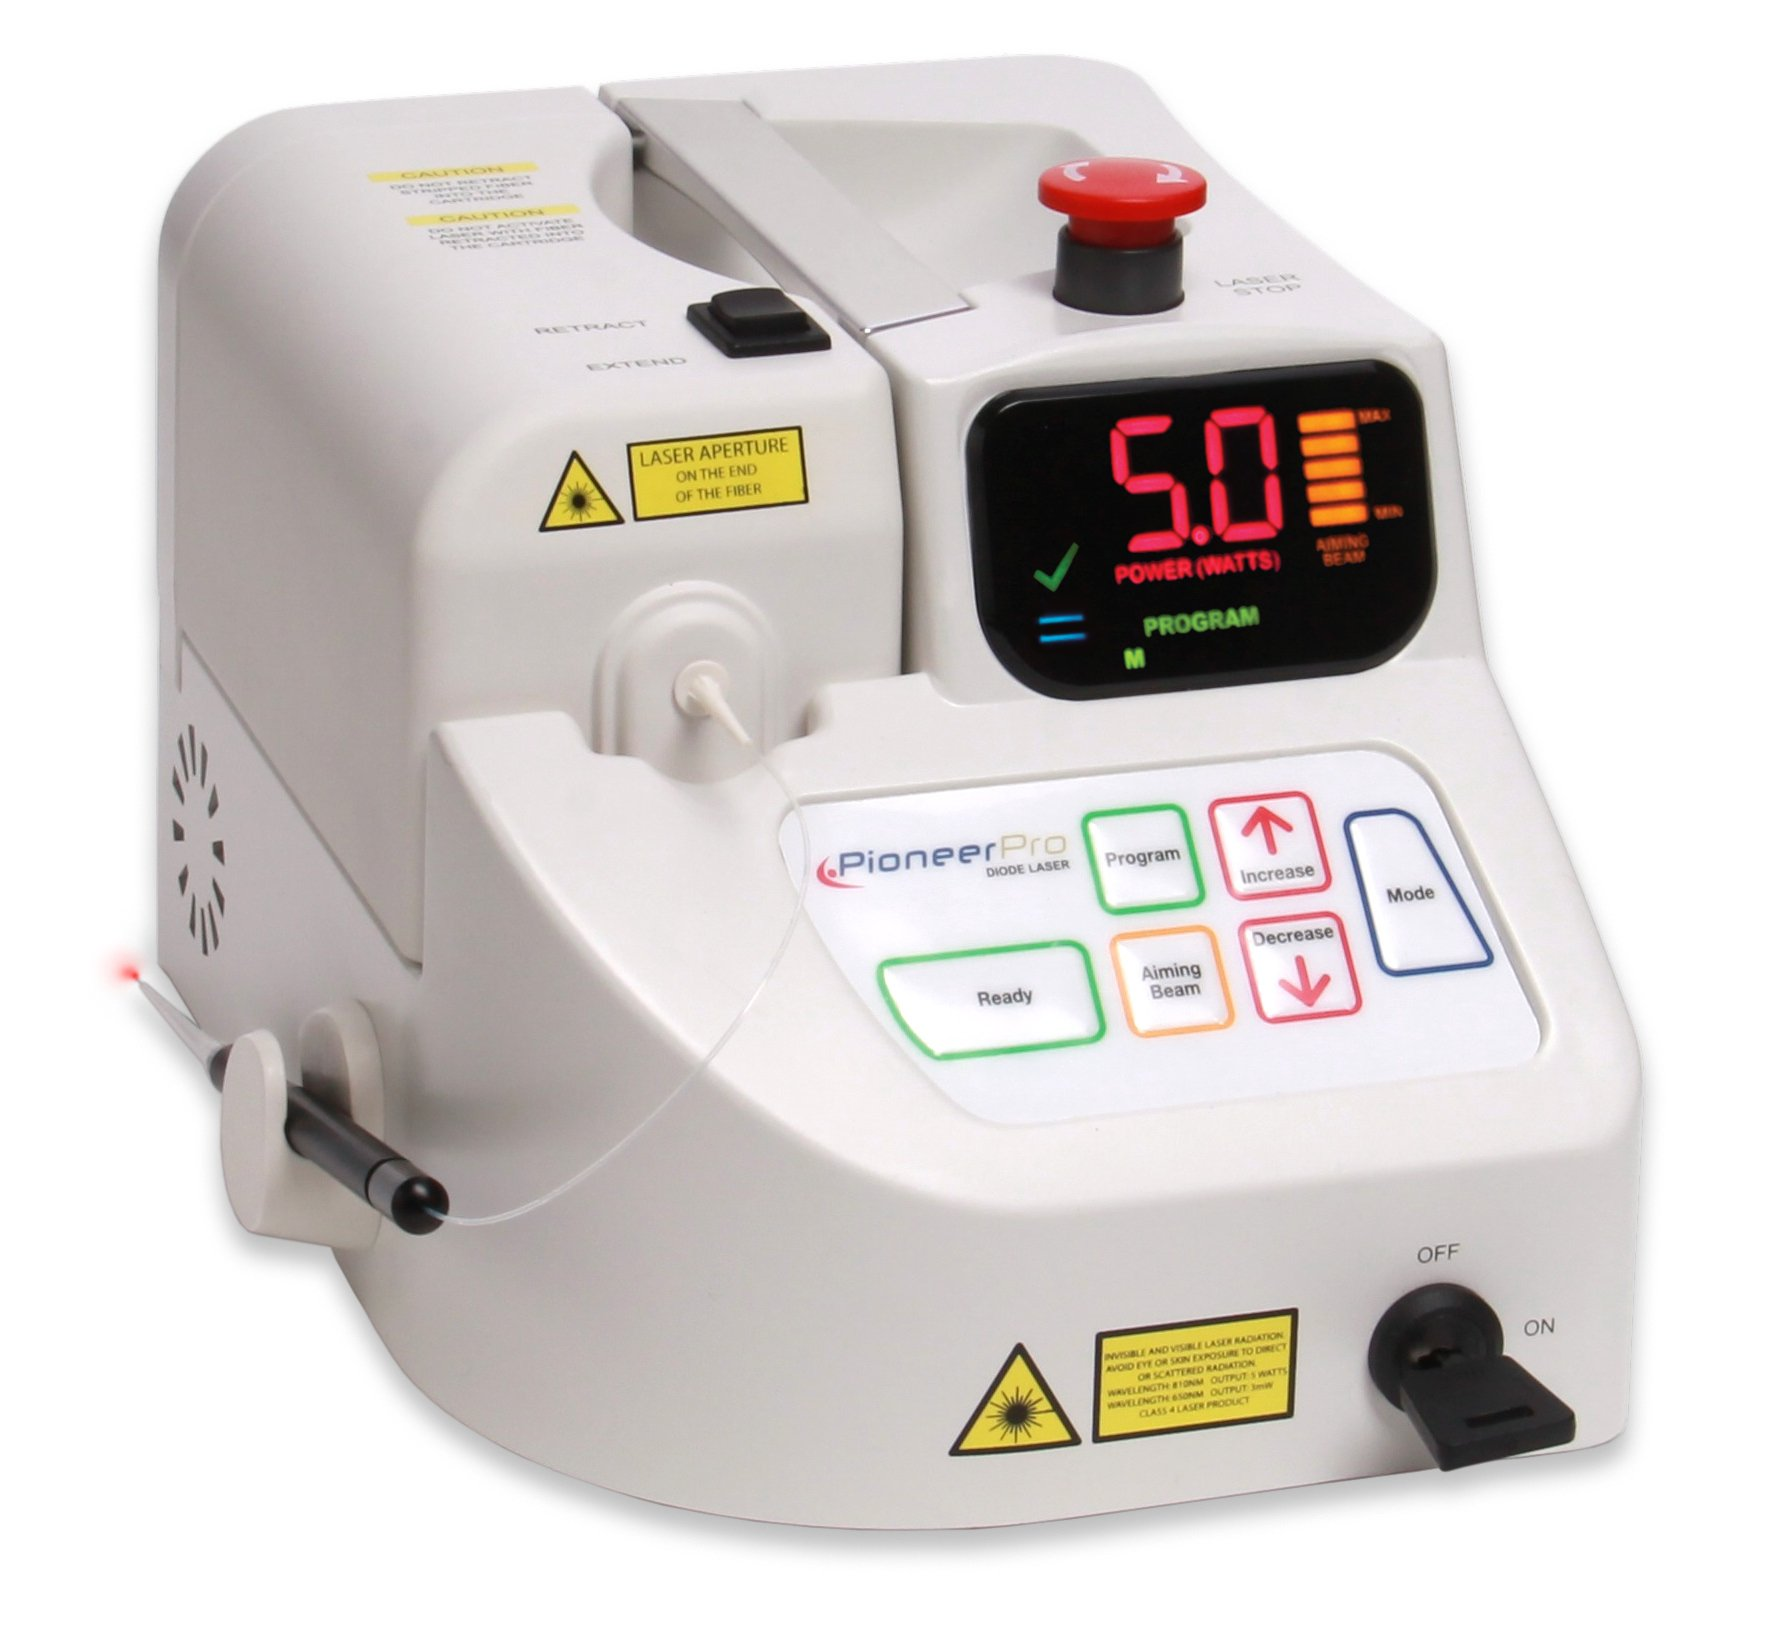 Pioneer Lasers 002-00128 Soft Tissue Diode Dental Laser